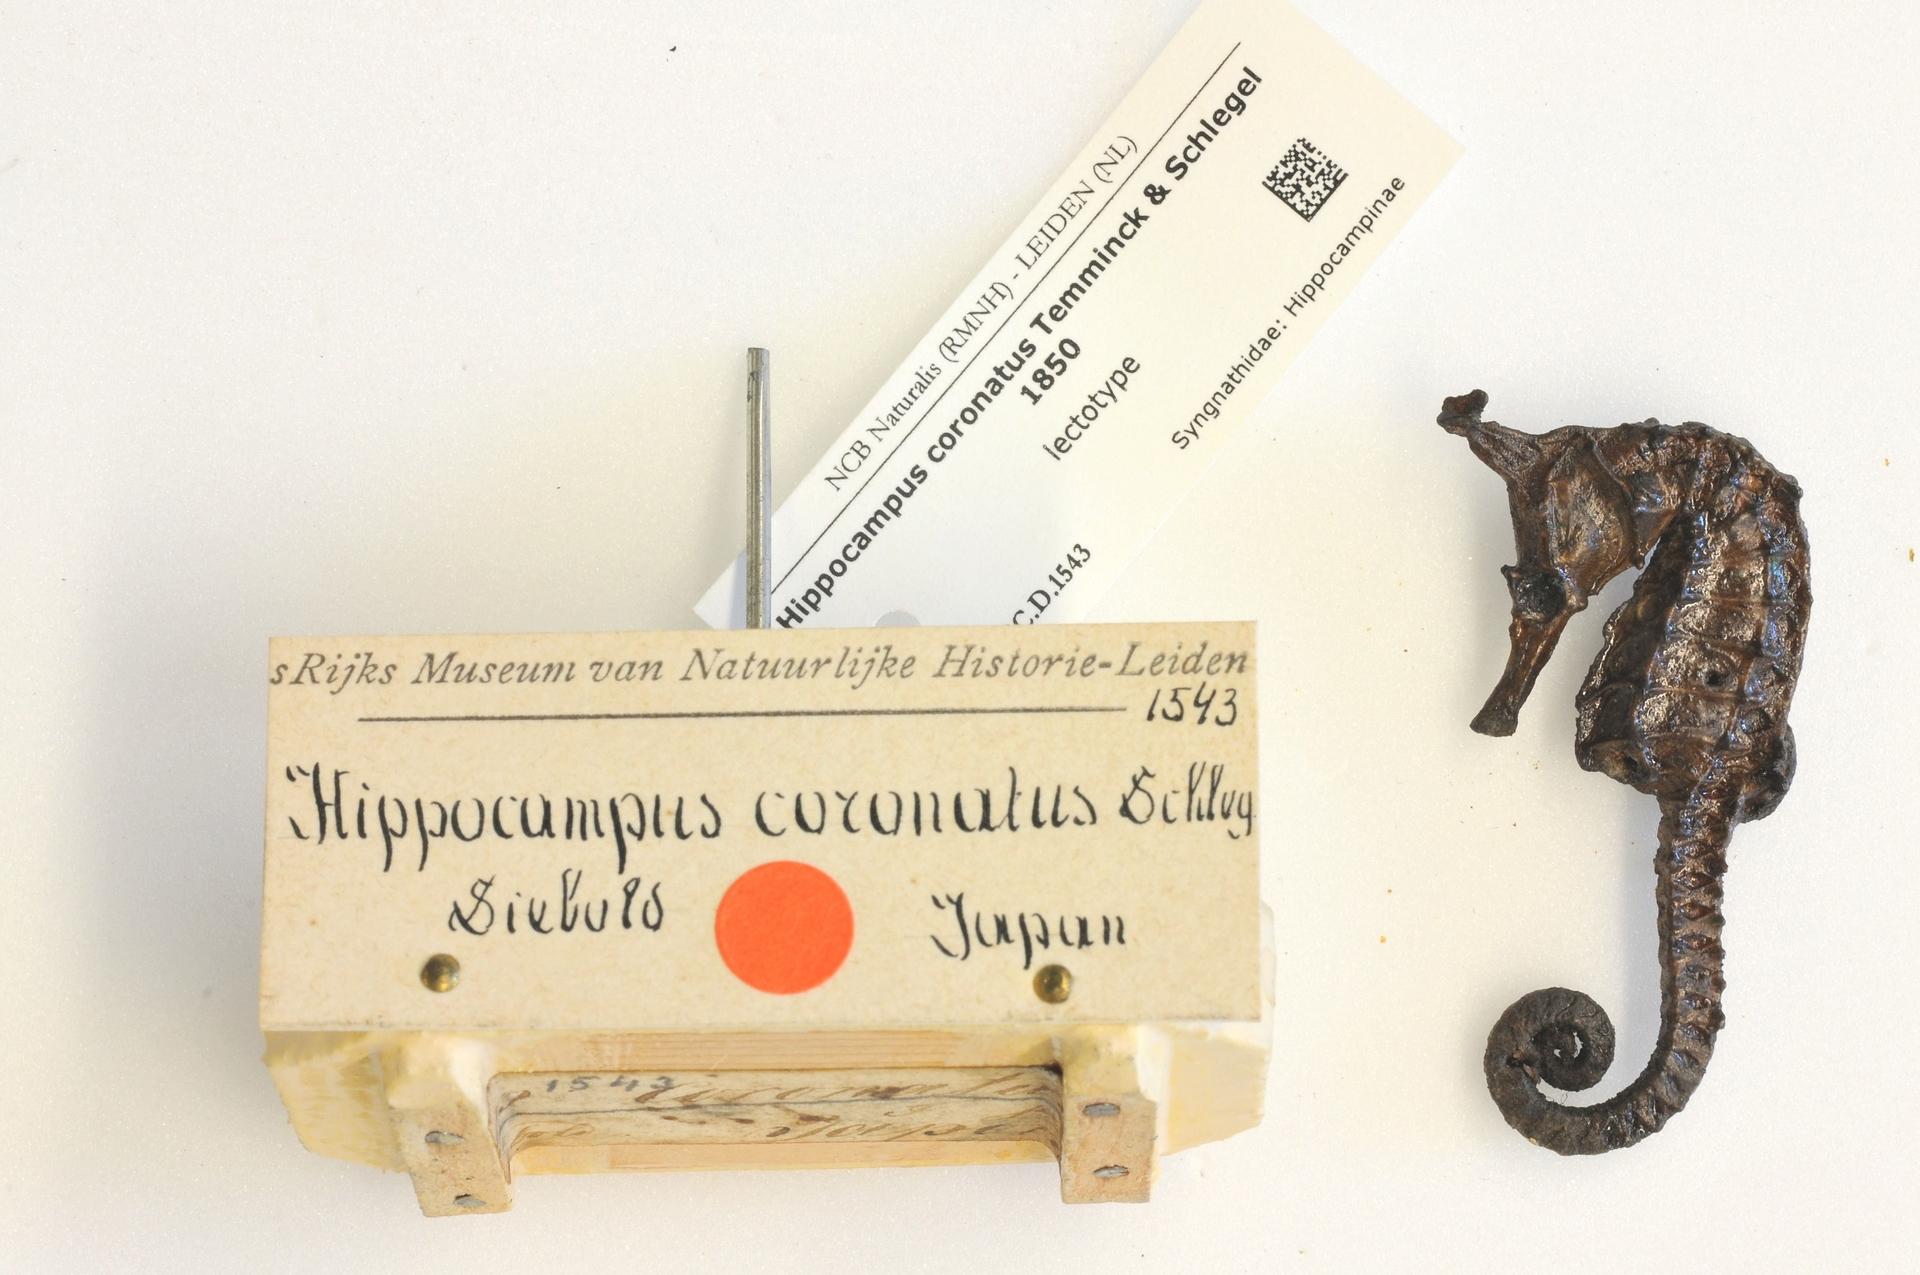 RMNH.PISC.D.1543   Hippocampus coronatus Temminck & Schlegel 1850